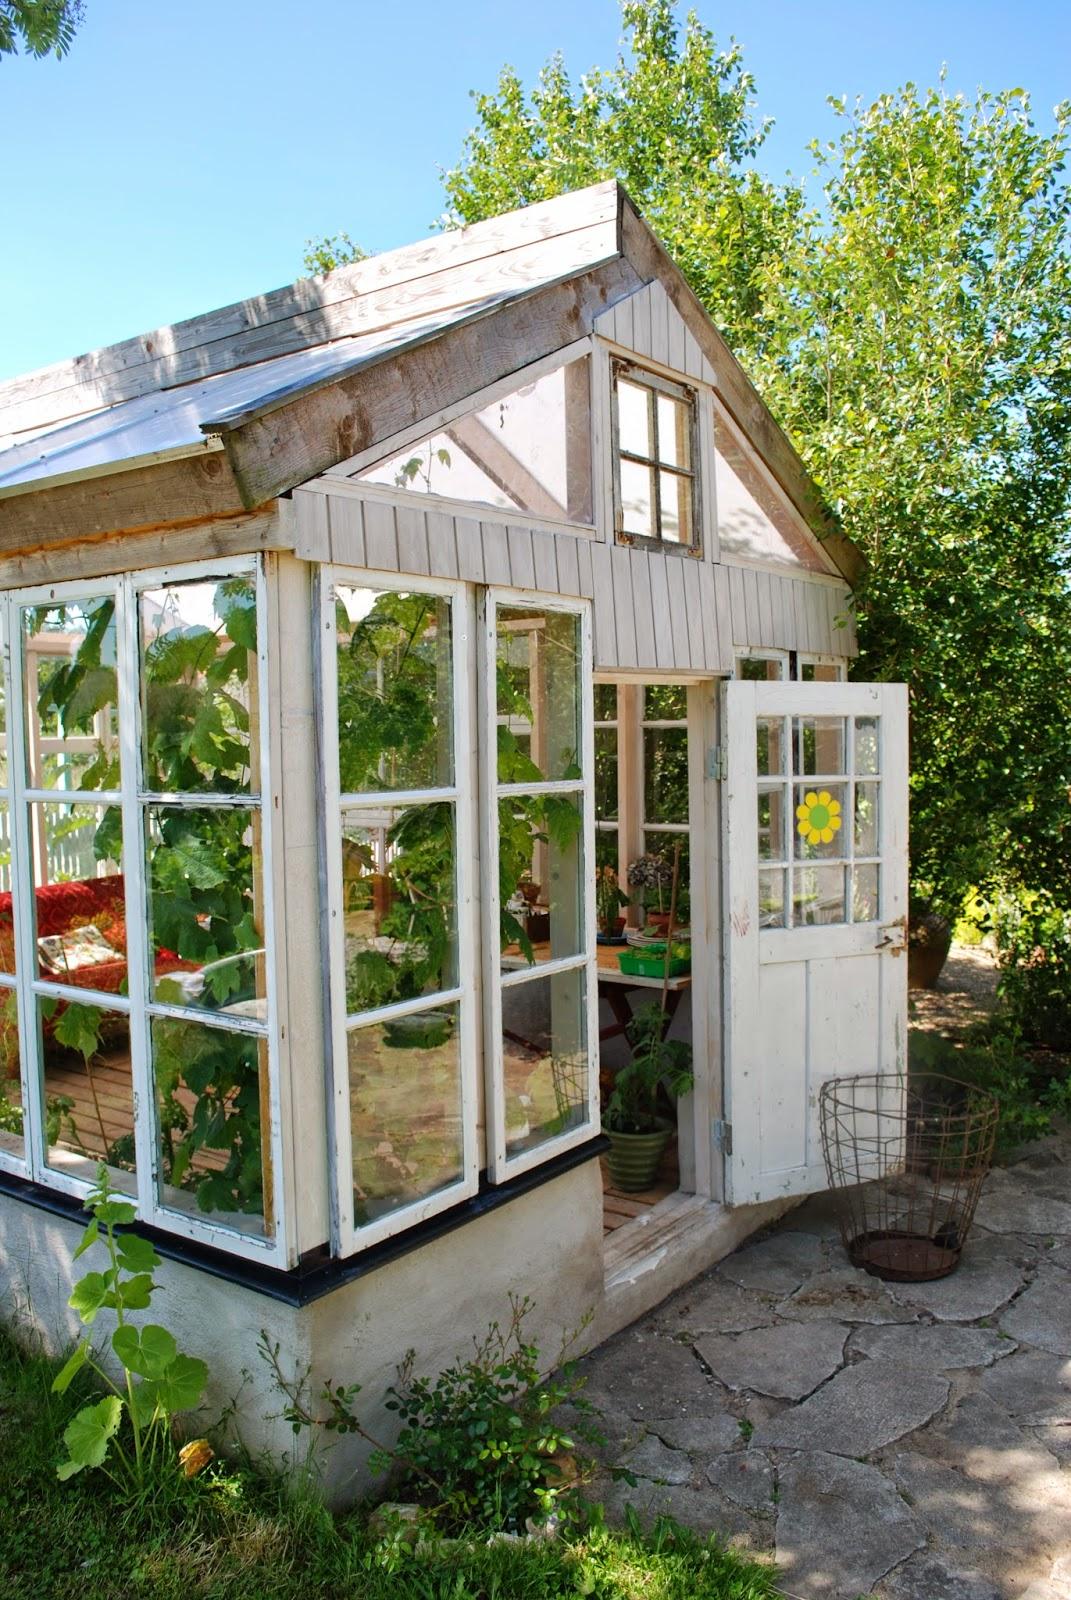 greenhouse kitchen window blue appliances old